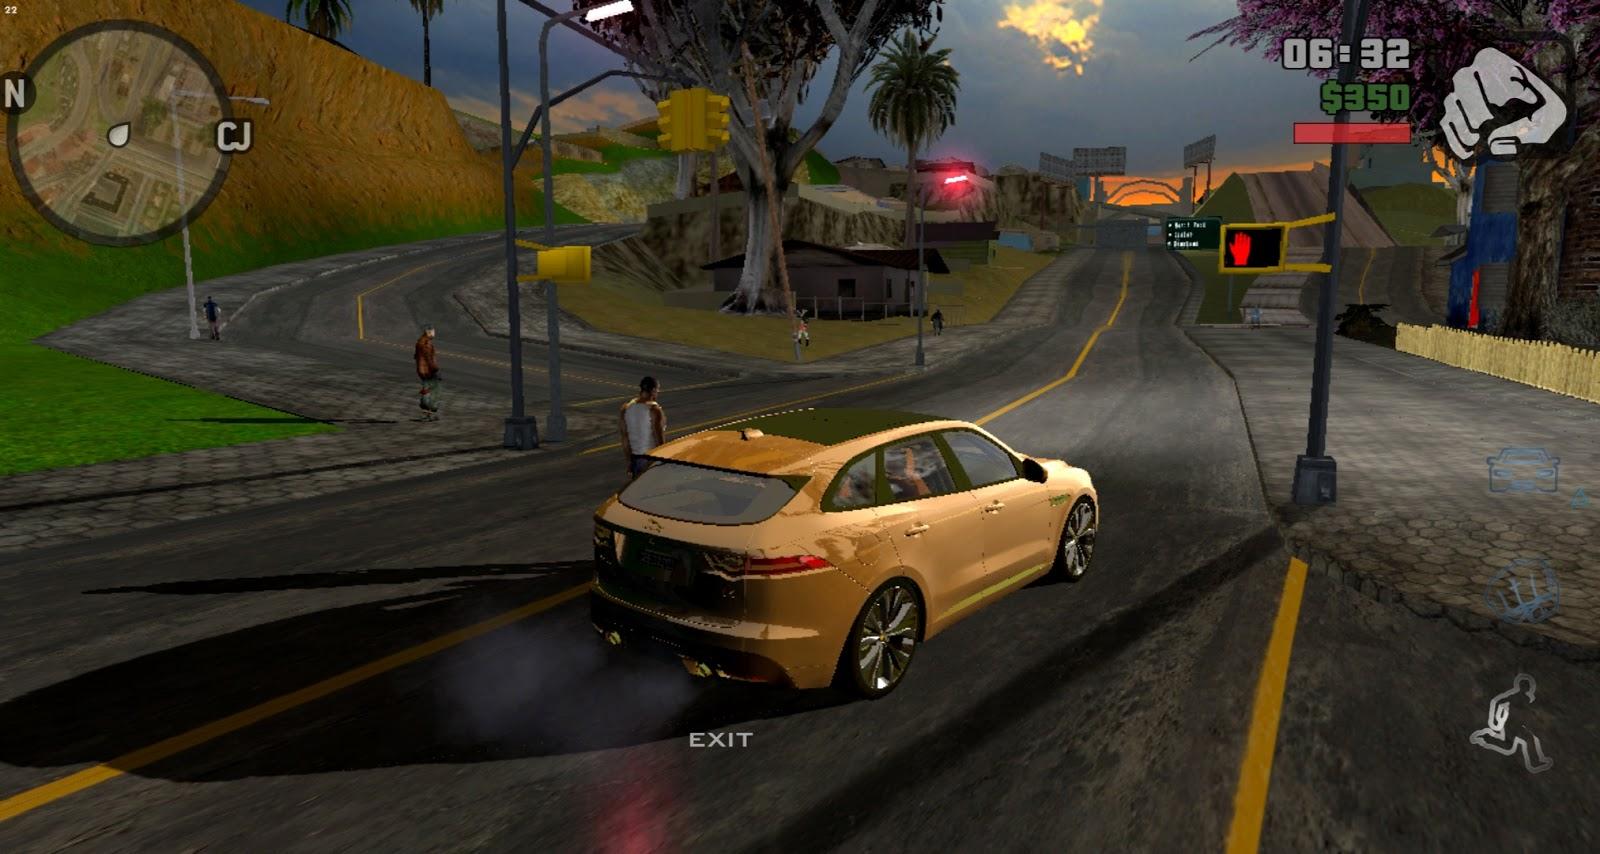 Grand Theft Auto San Andreas GTA Cleo Cheat Mega Mod Apk Data HD